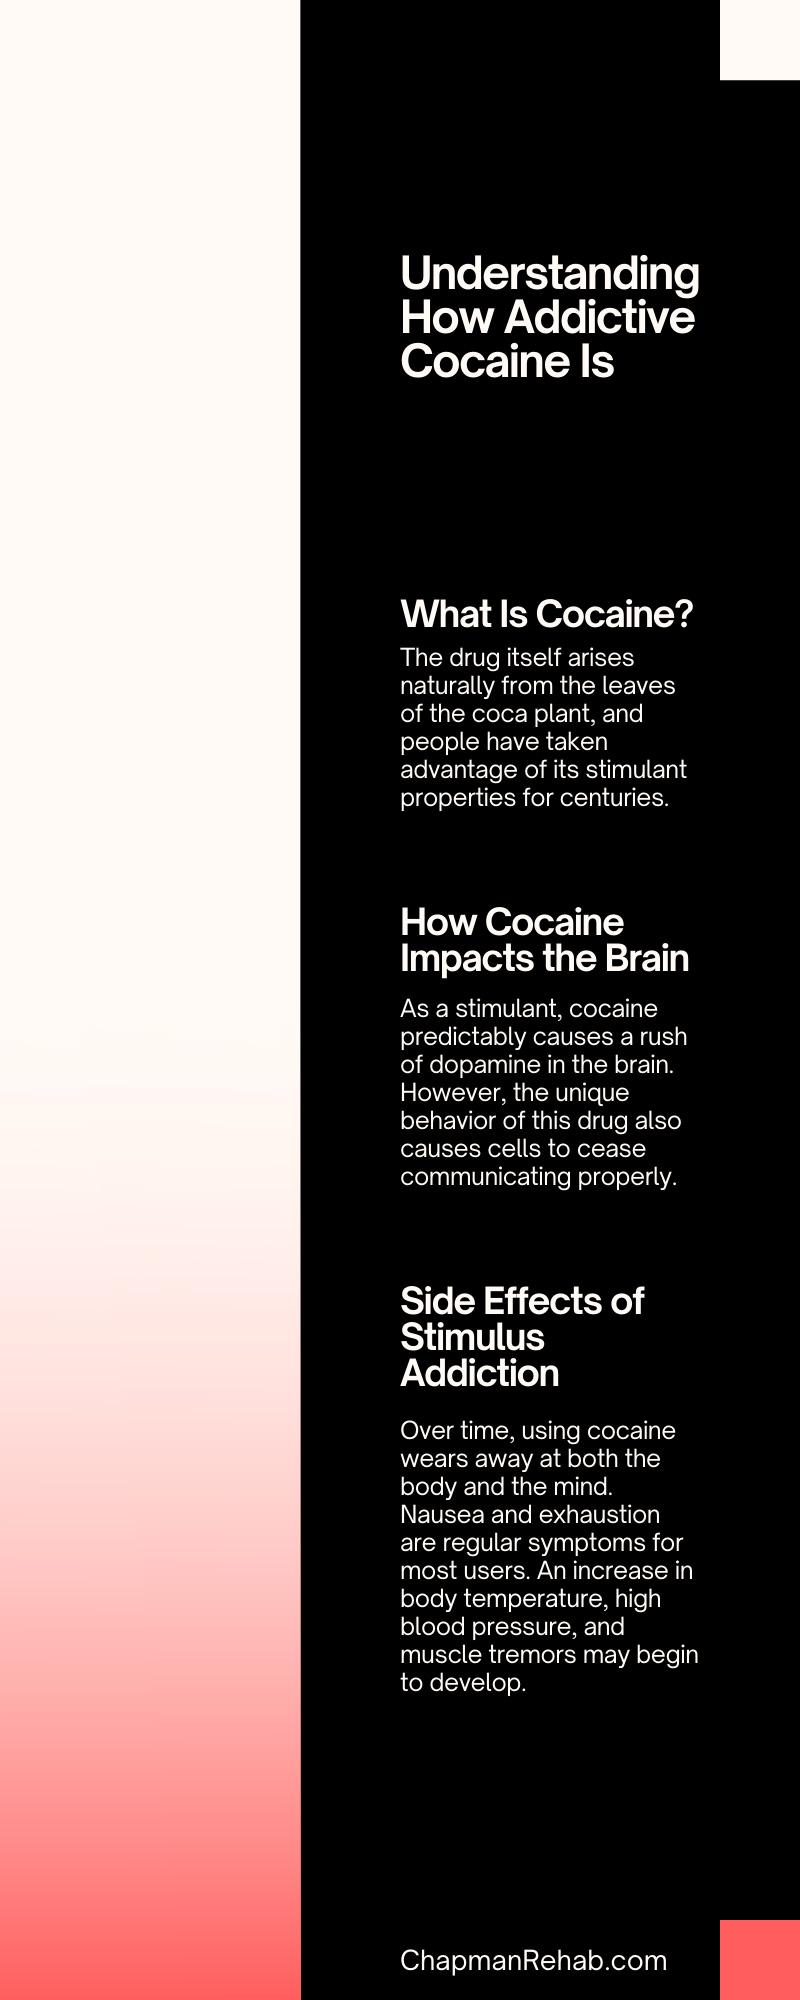 Understanding How Addictive Cocaine Is